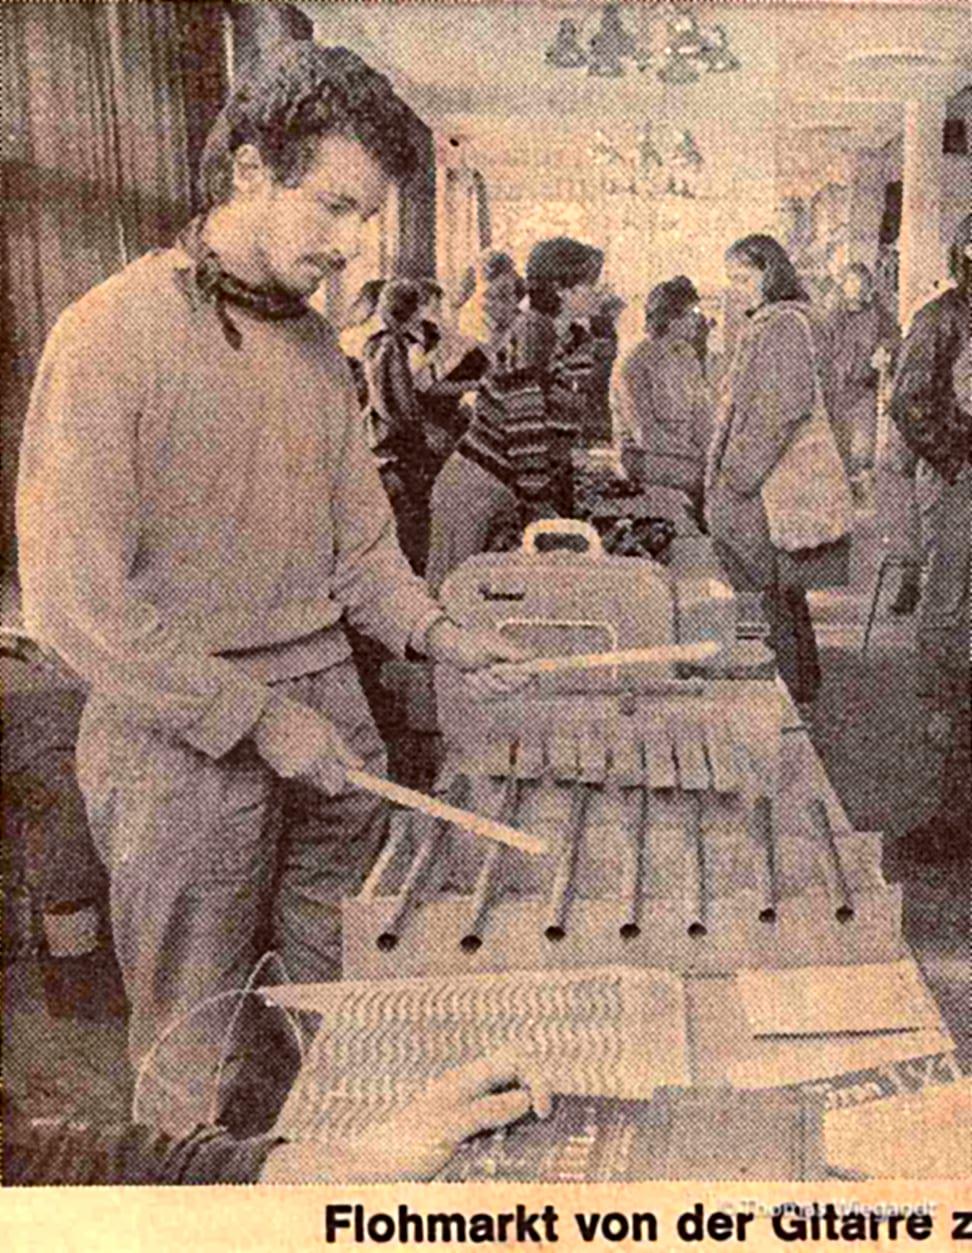 Cuprophone (Newspaper 1984)